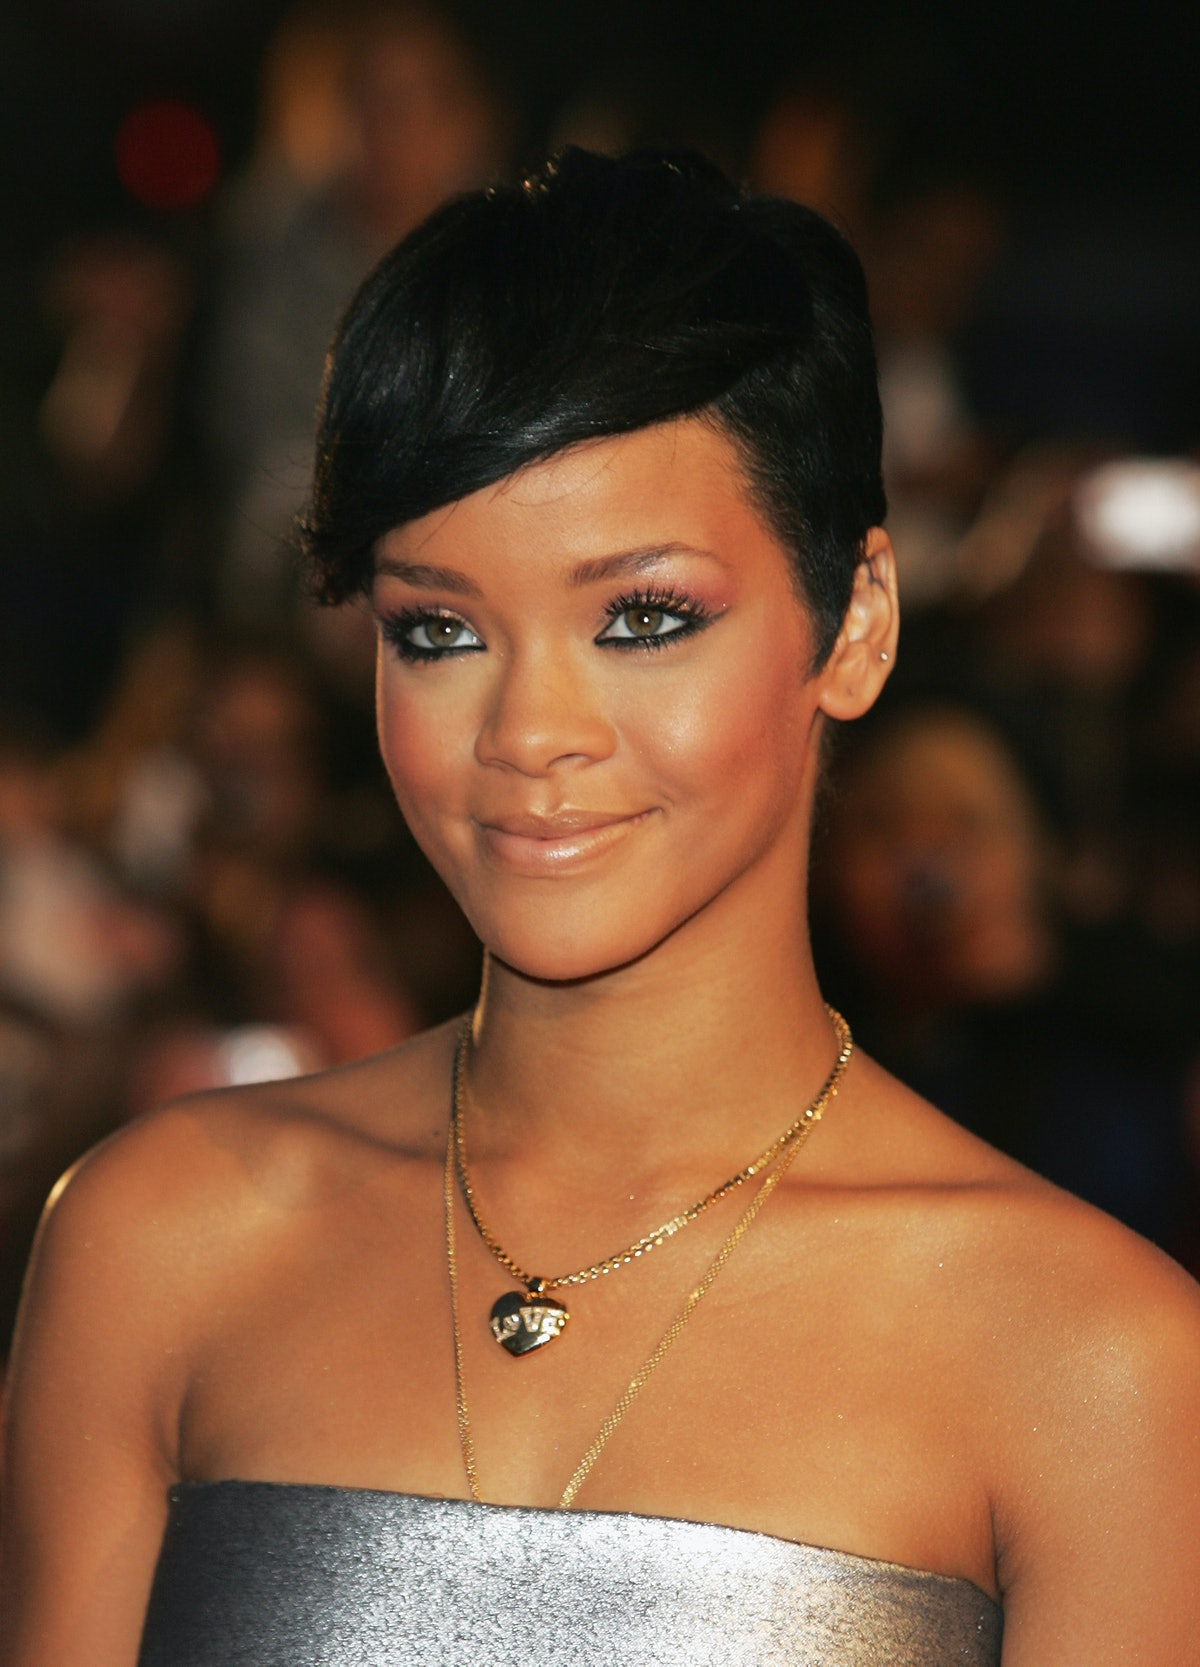 Rihanna arrives at the Brit Awards 2008